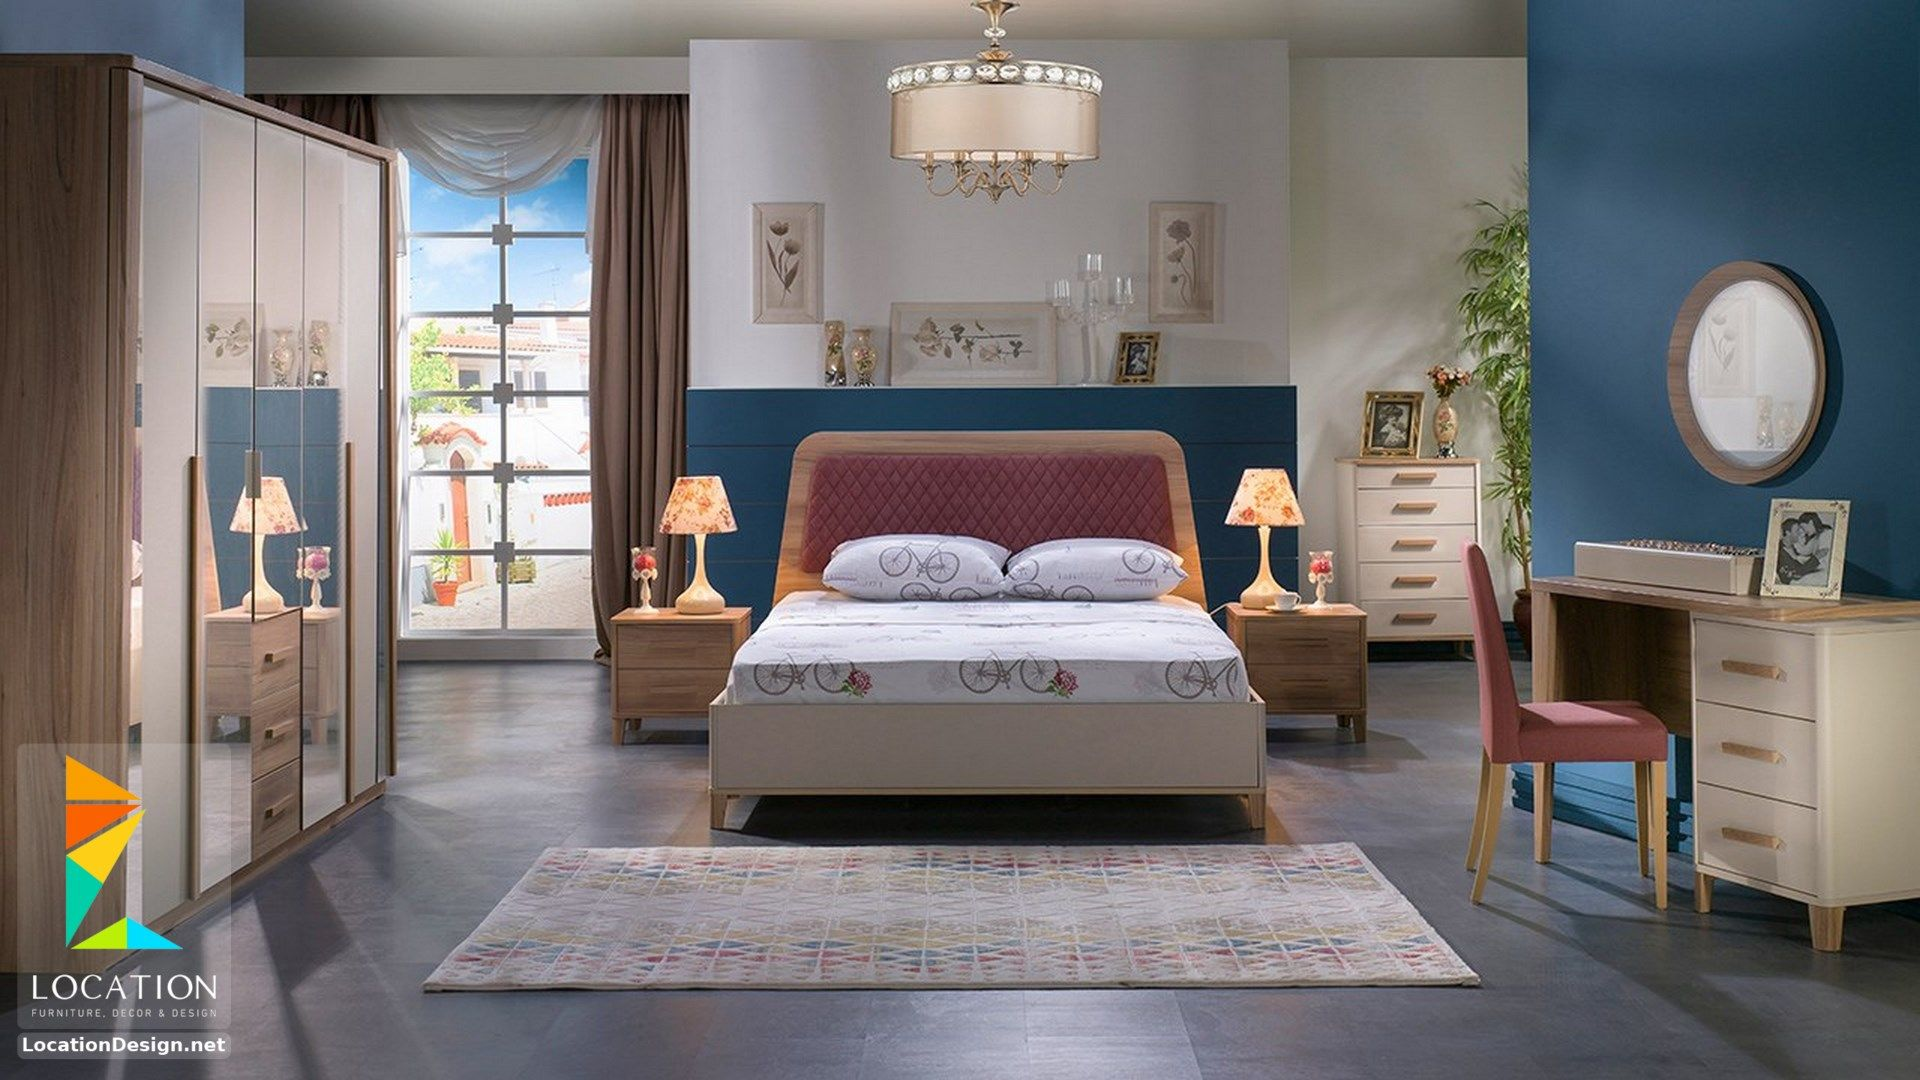 احدث موديلات و اشكال غرف نوم تركي 2019 2020 Bedroom Set Istikbal Furniture Bedroom Photos